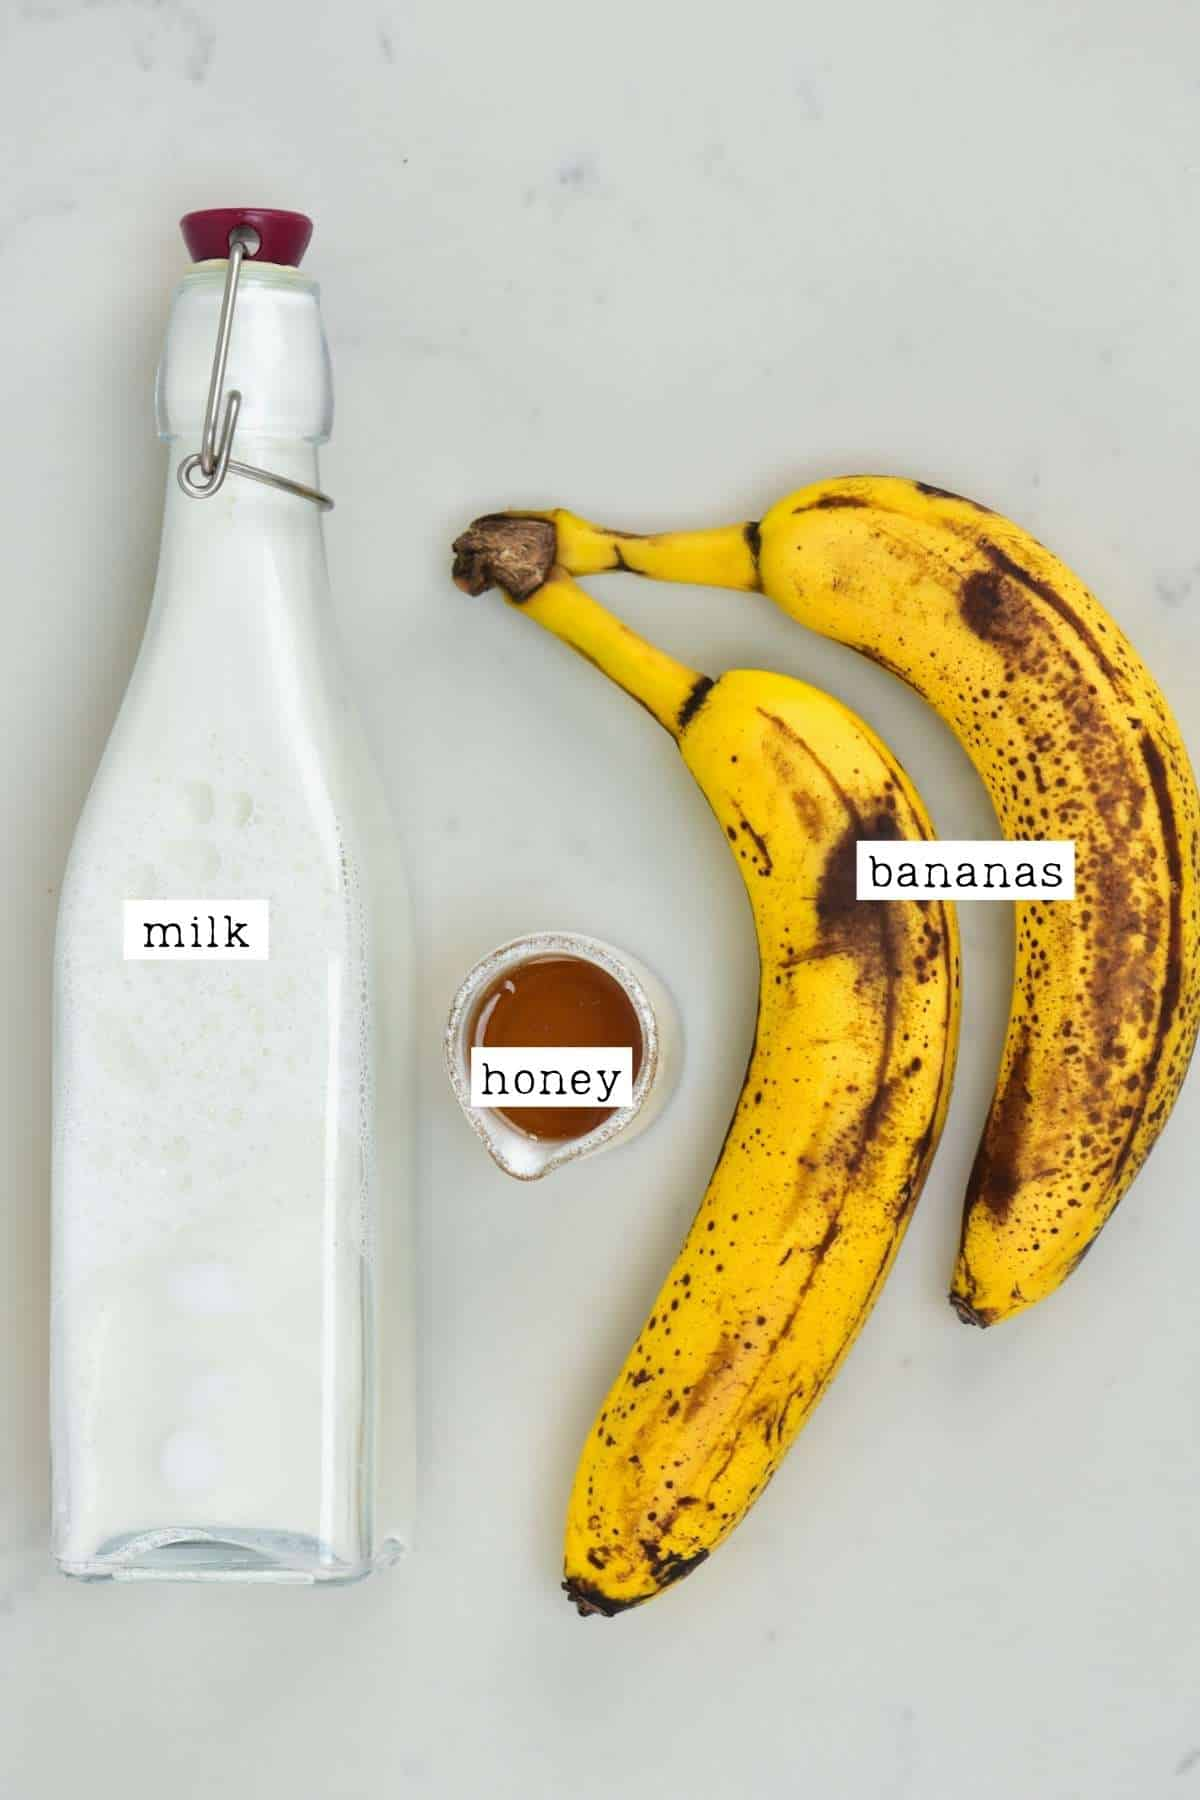 Ingredients for banana milkshake